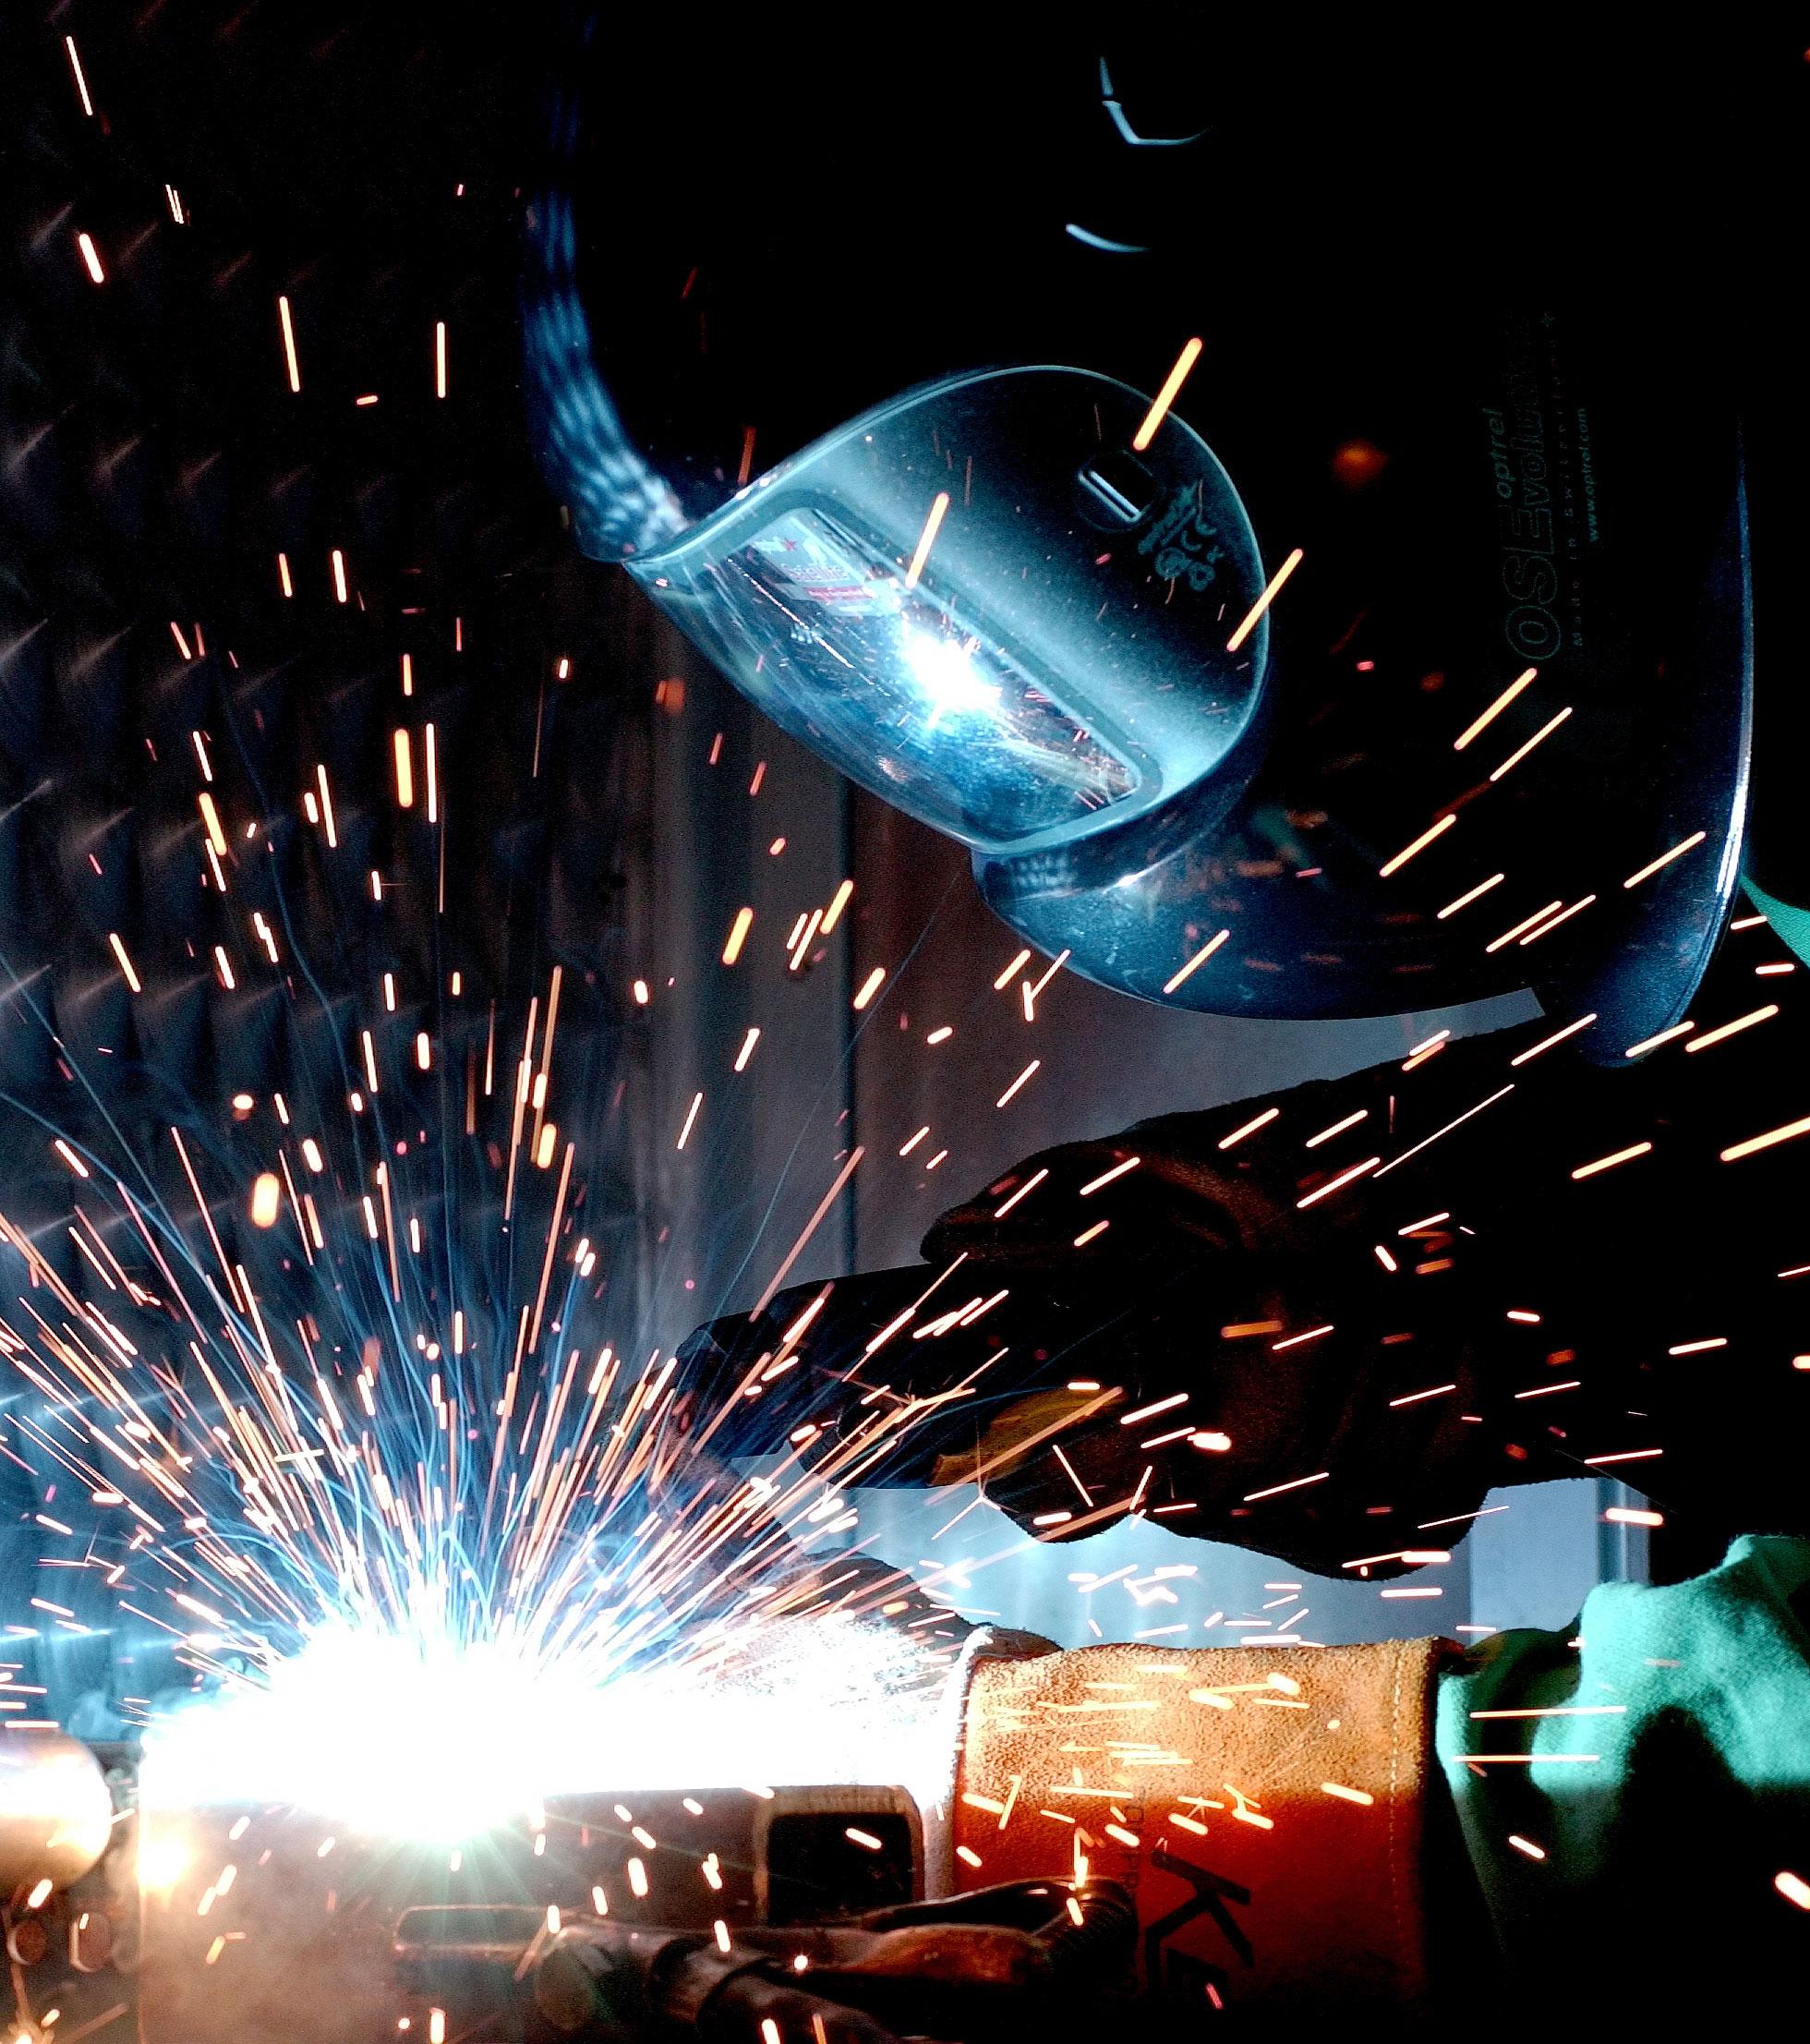 GMAW.welding